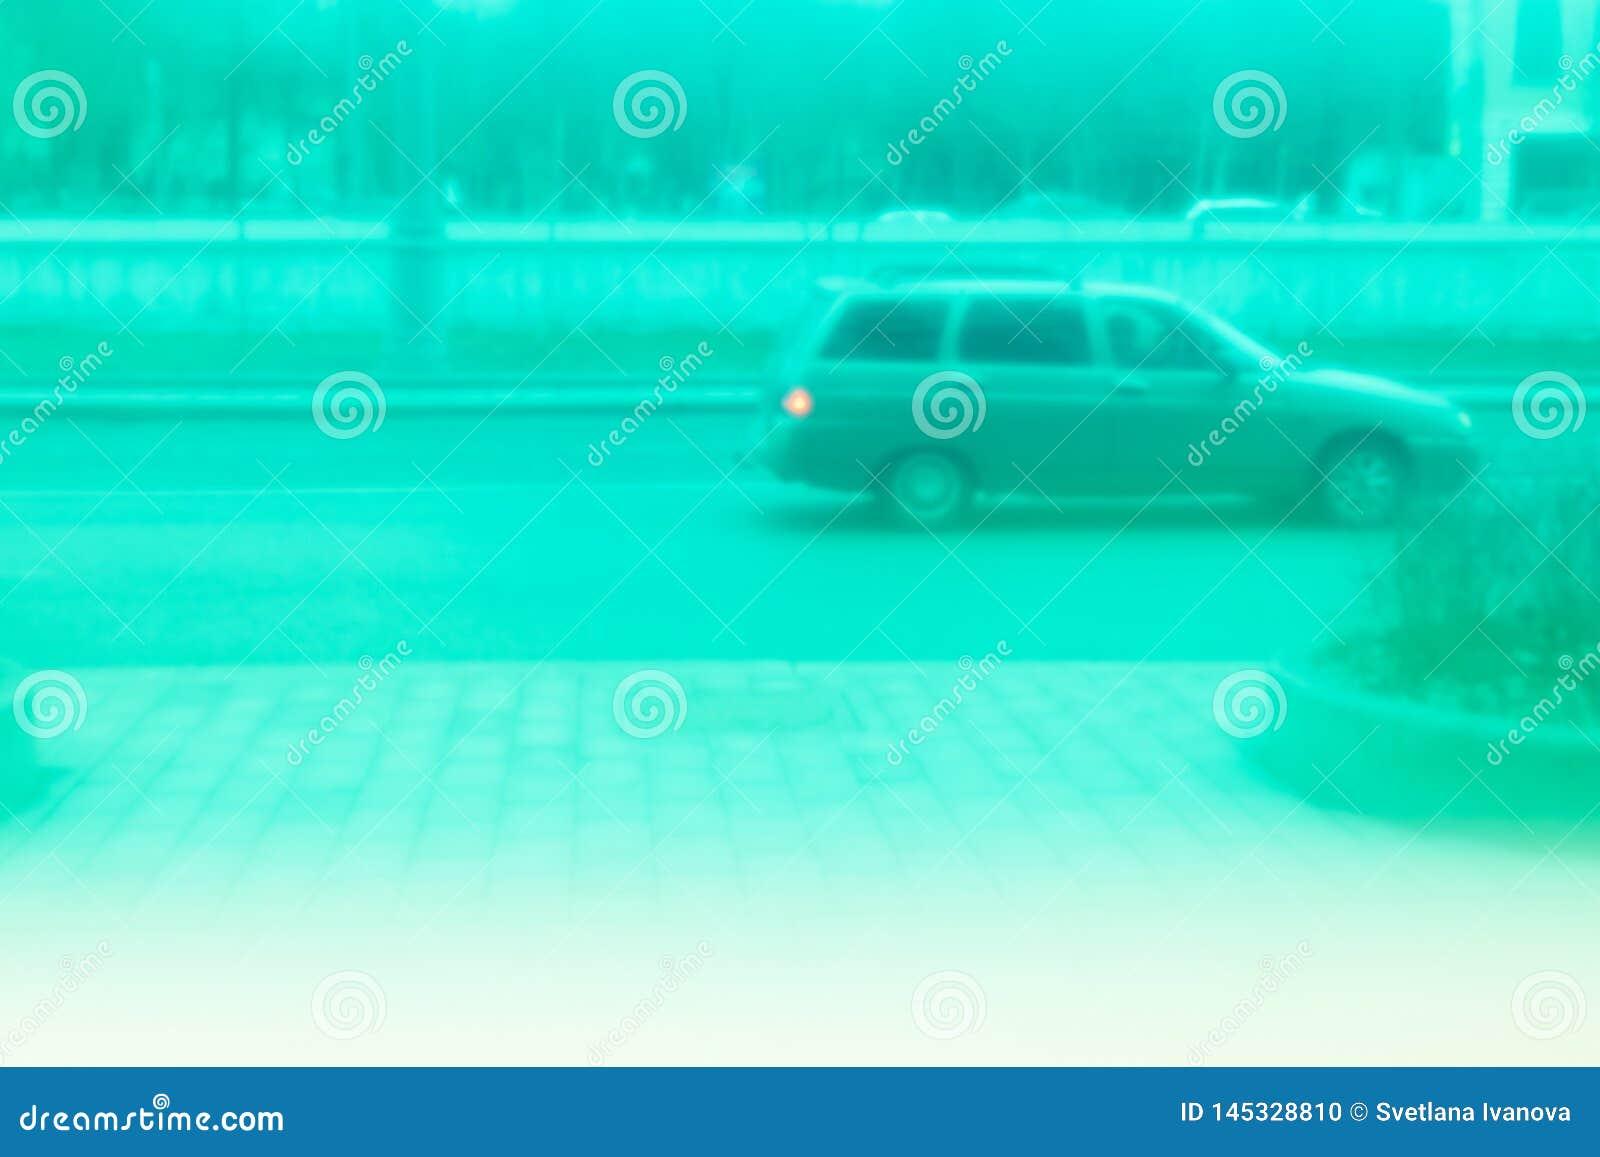 Old car rides around town. View through green glass. Retrowave.